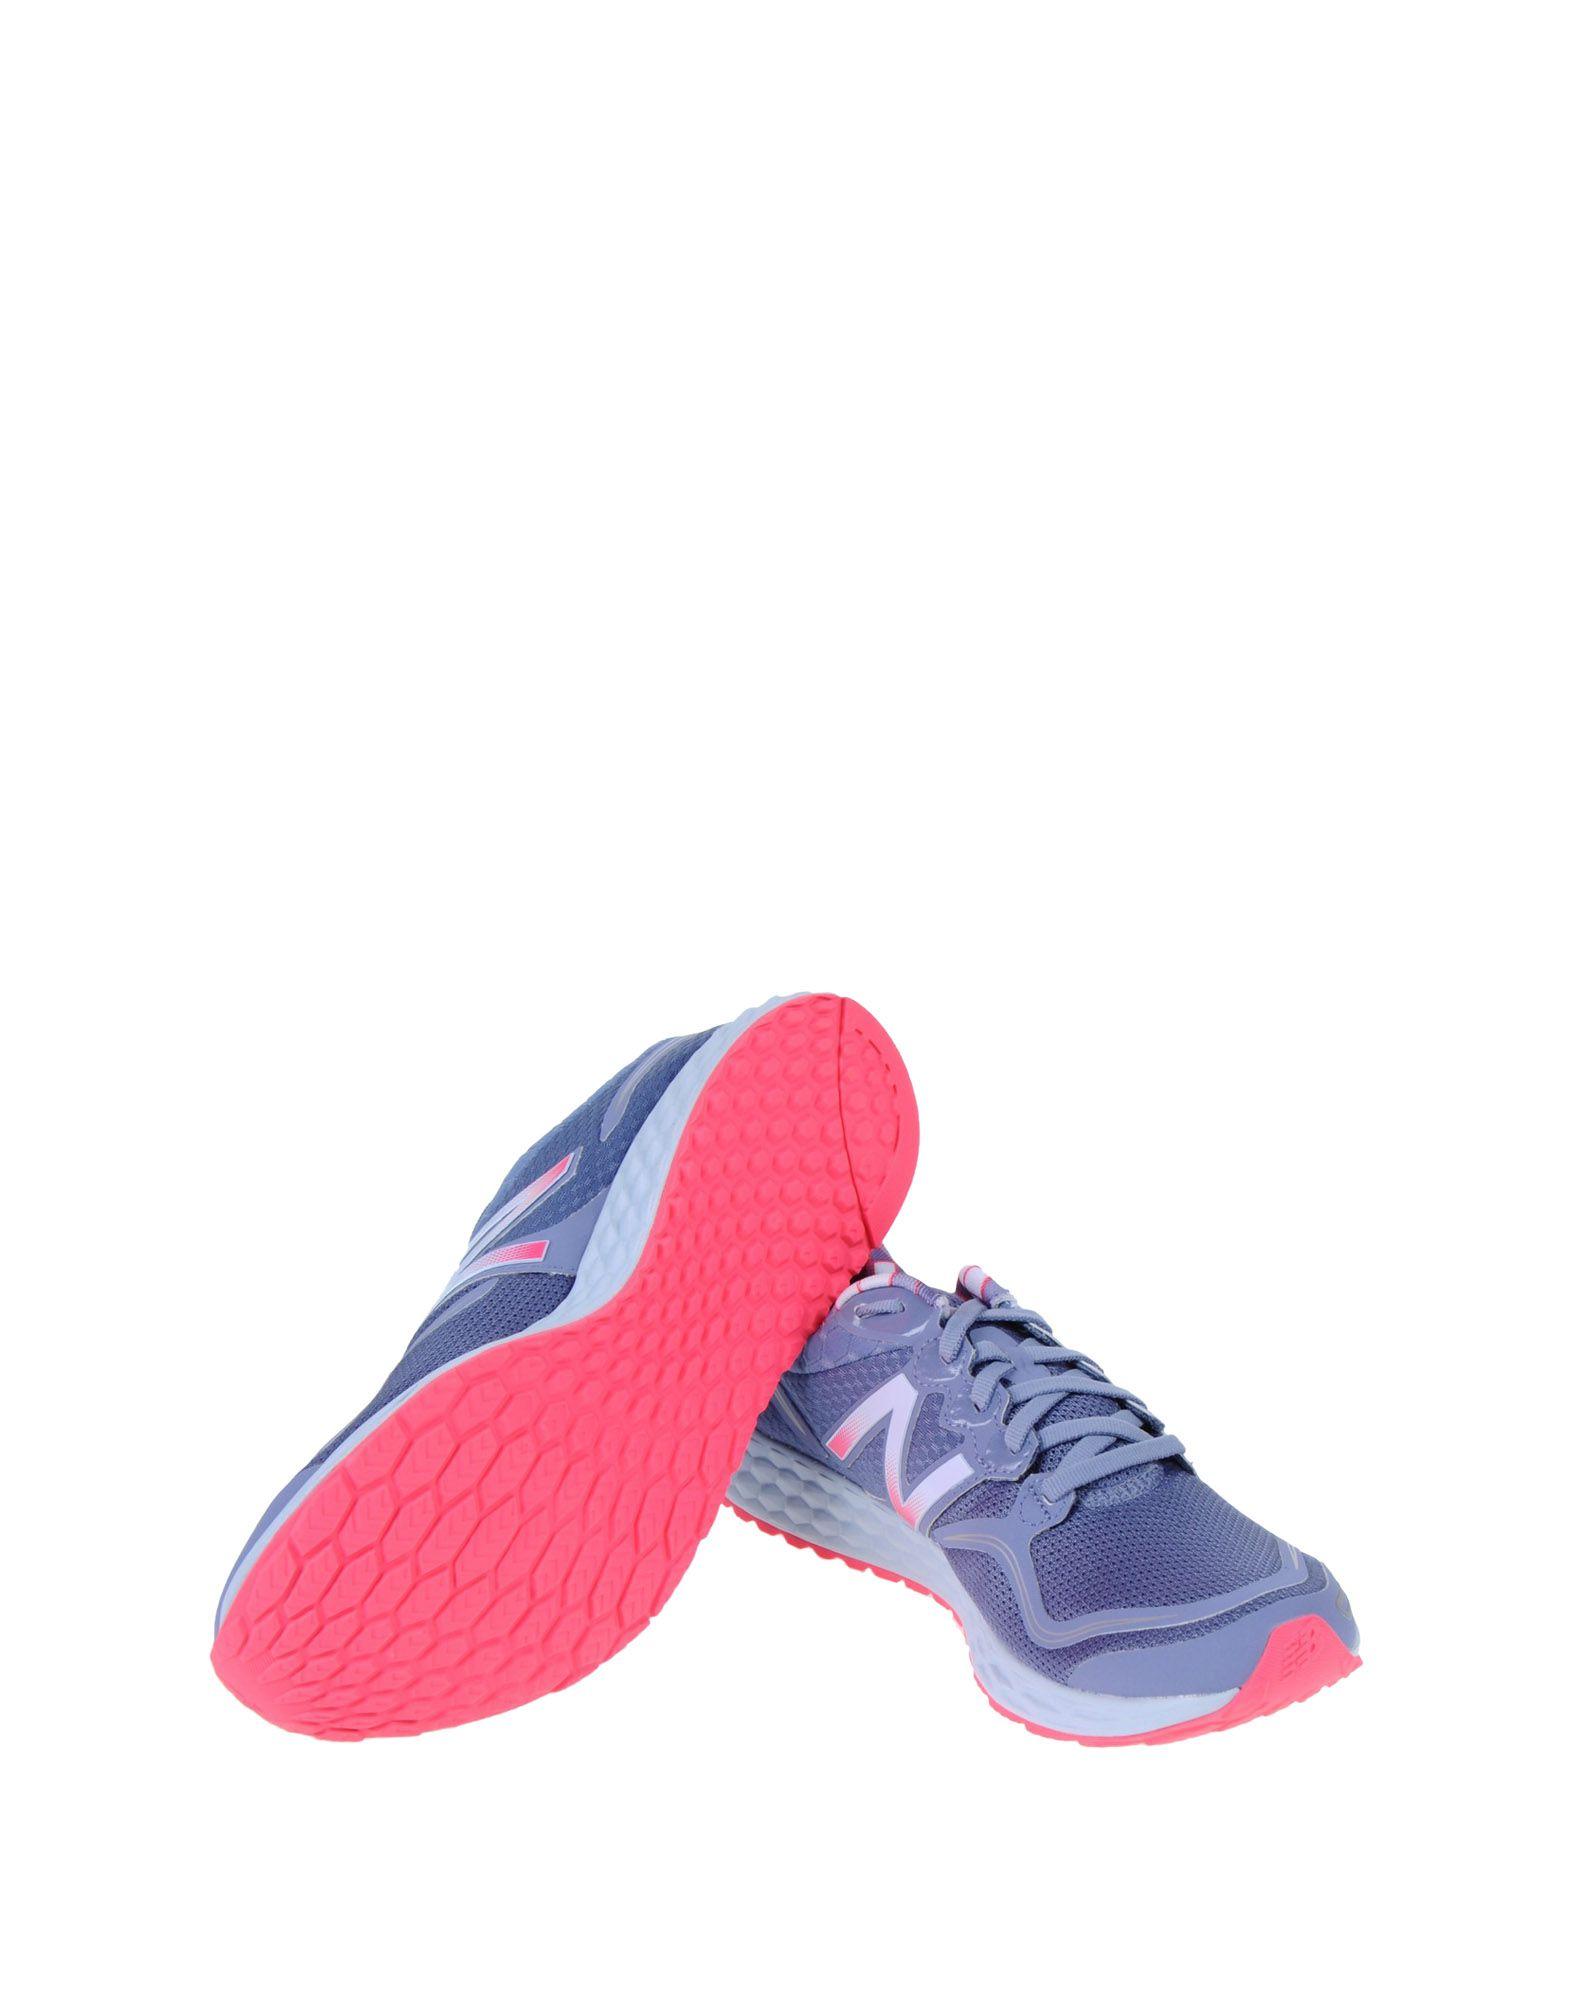 Zante New Balance Fresh Foam Zante   44908164FA b102d6